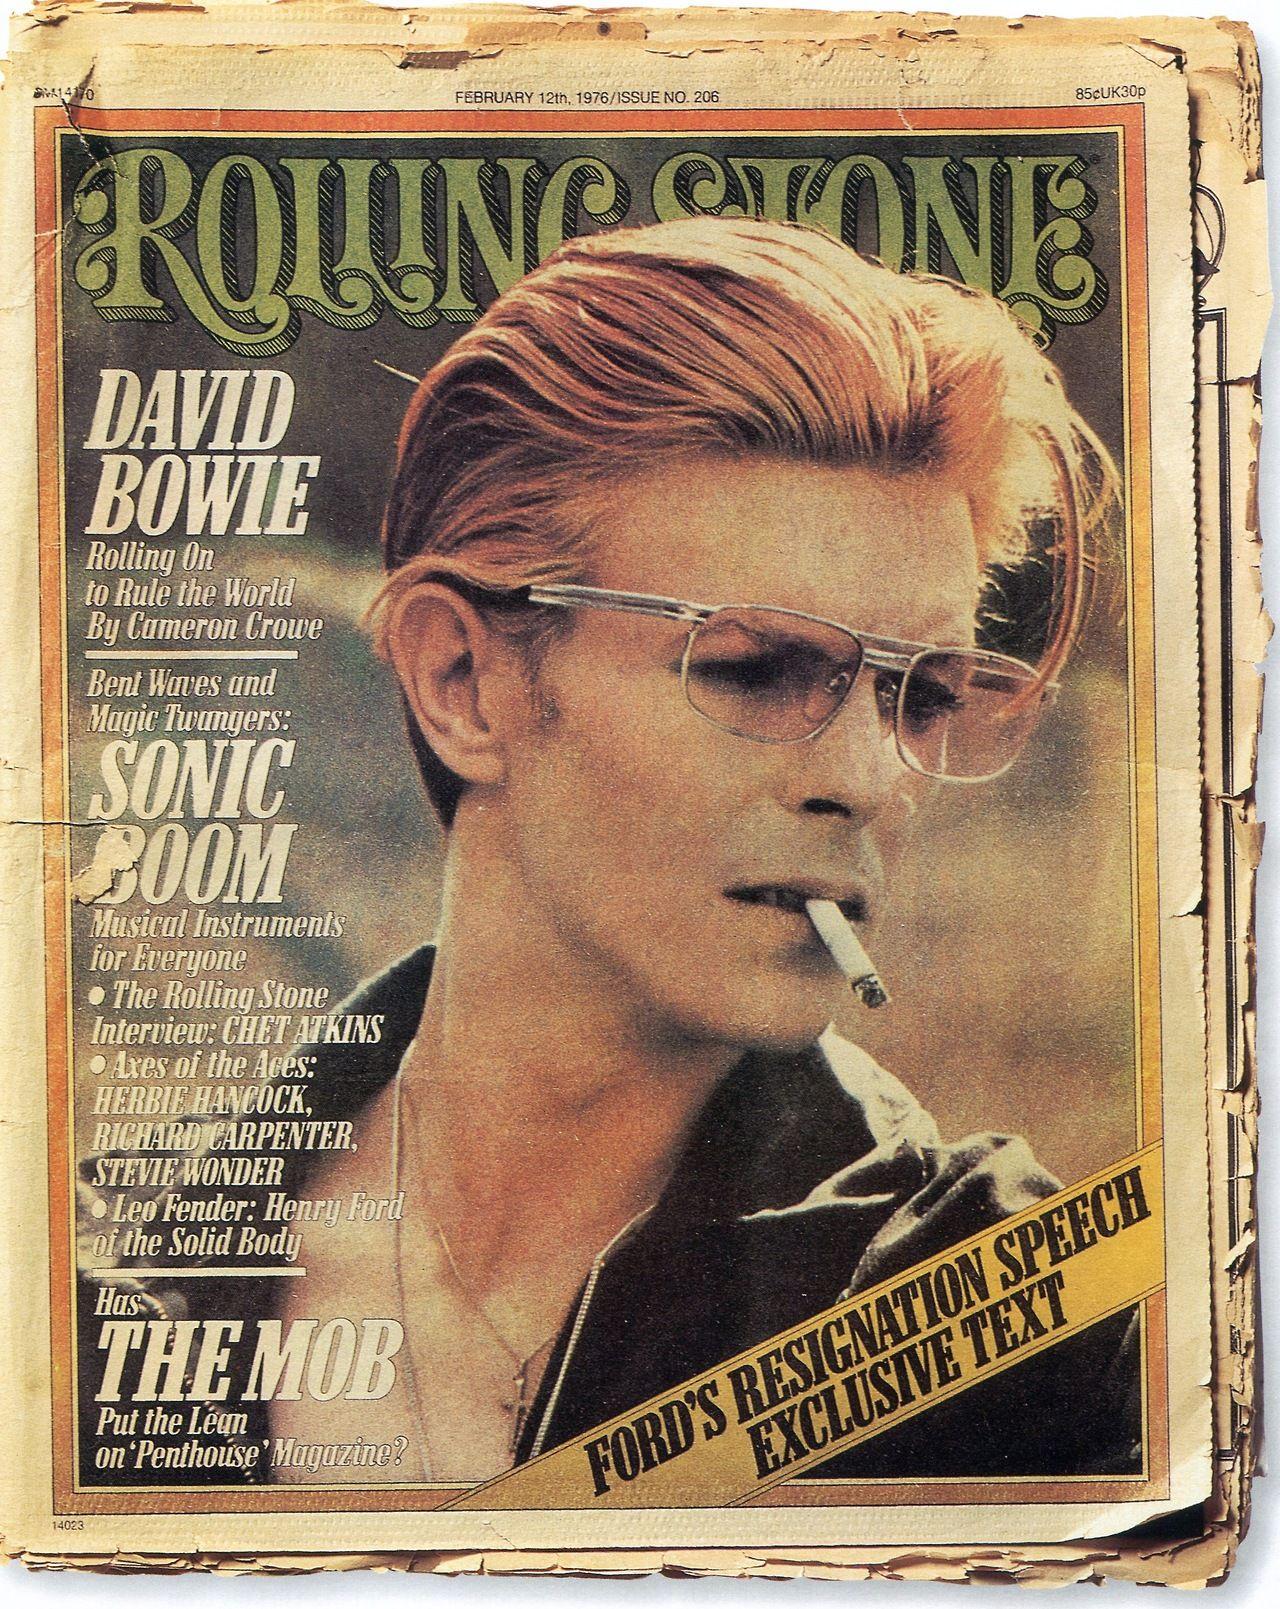 The Amazing David Bowe